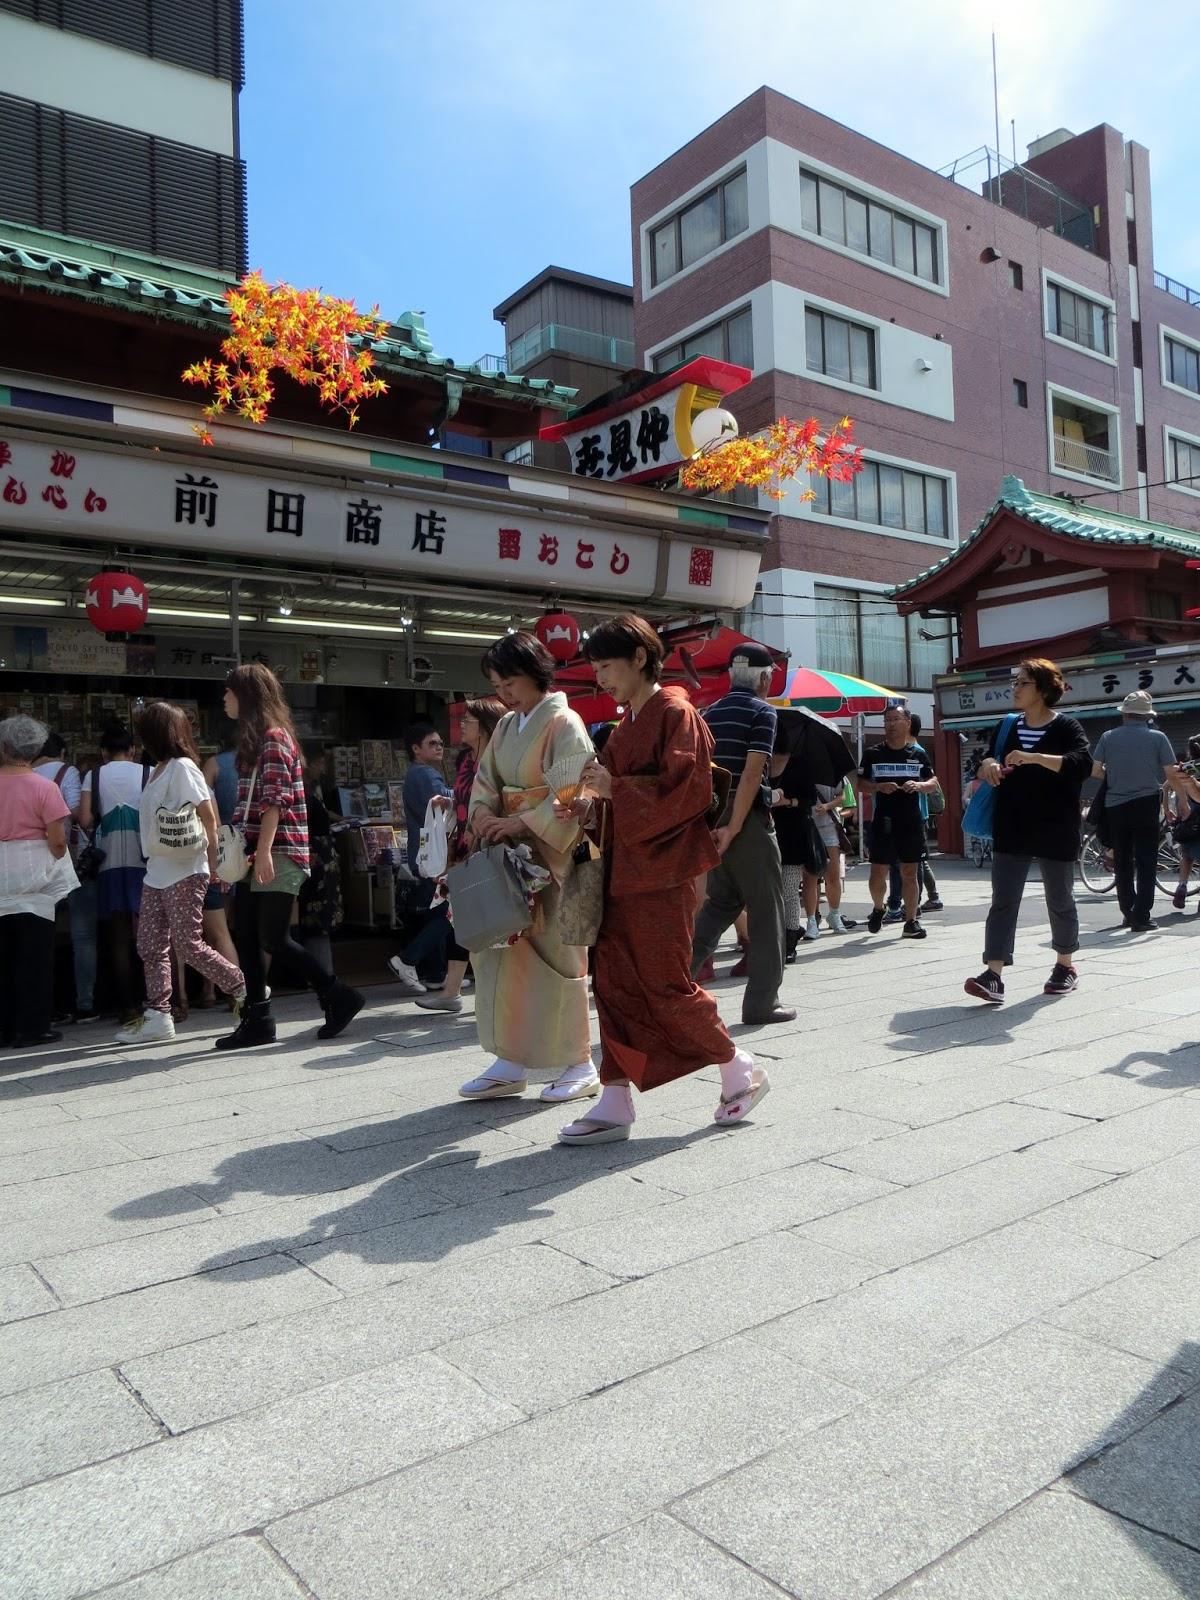 Women in Kimonos walk past a temple in Tokyo, must do tokyo